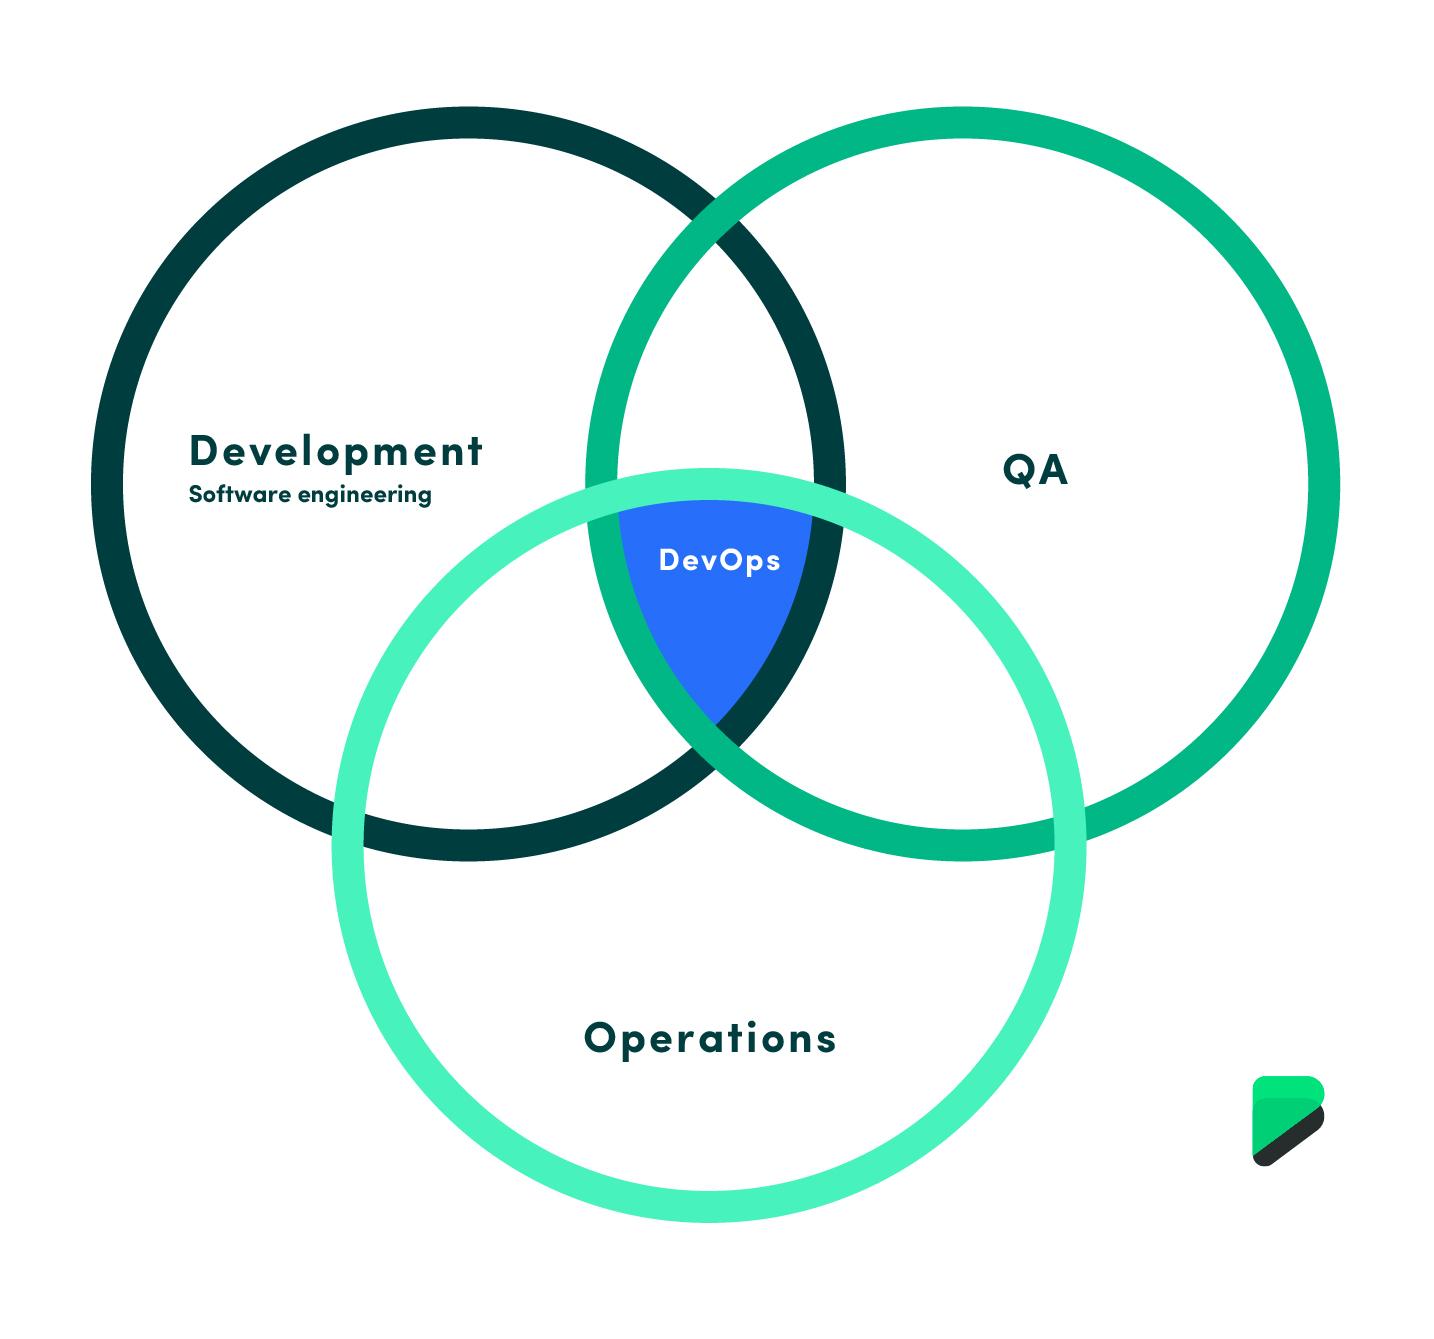 DevOps venn diagram, showing how devops is the combination of Development, QA and Operations